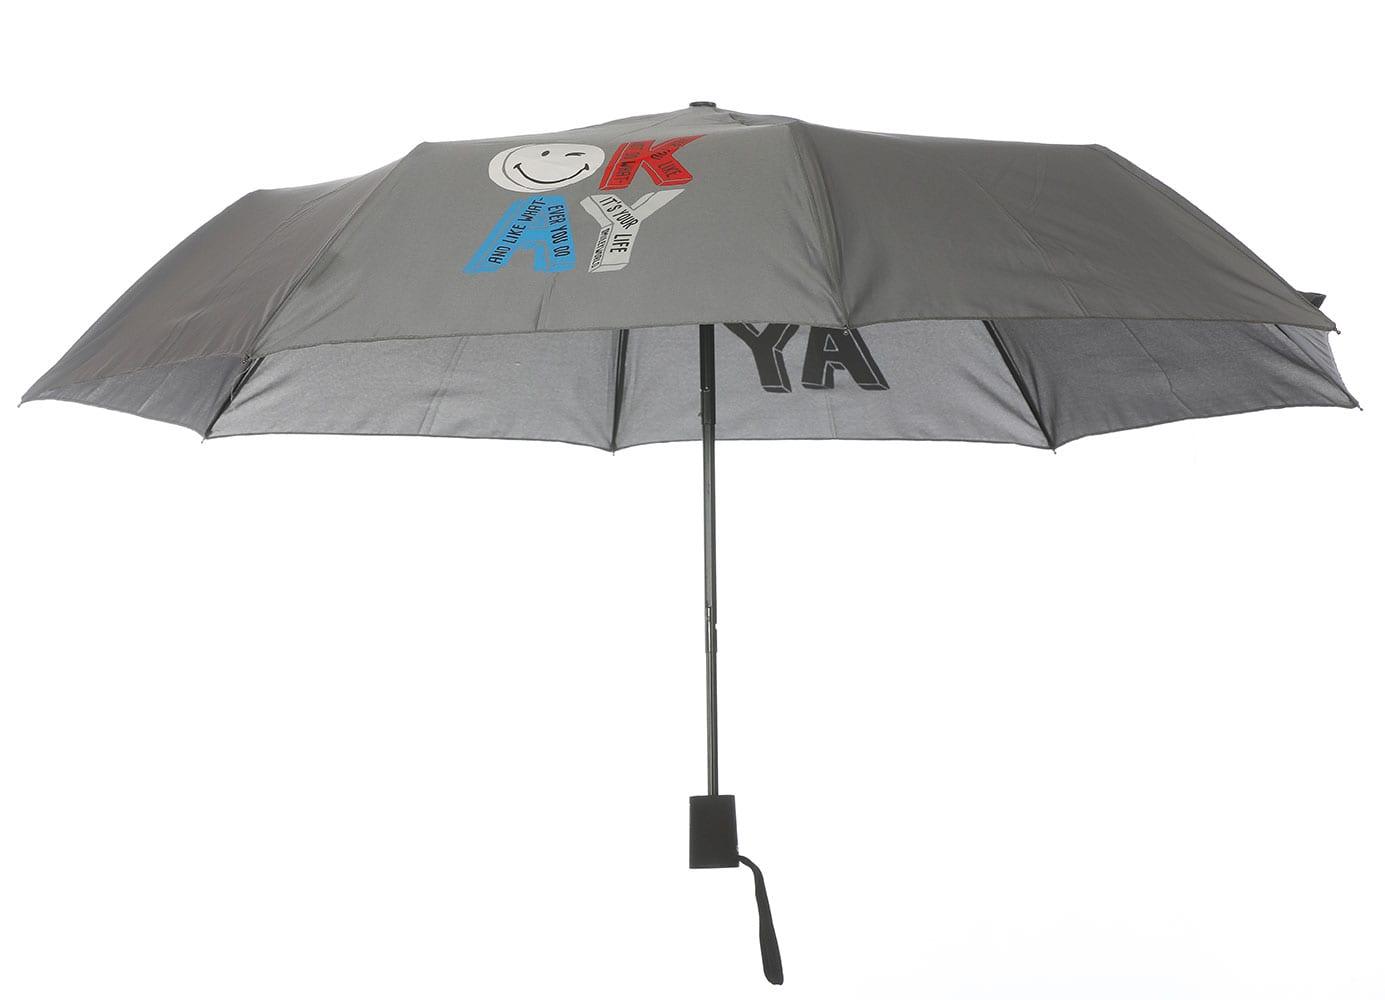 Smiley World Ομπρέλα Σπαστή με Αυτόματο Μηχανισμό SML-9230 Γκρί